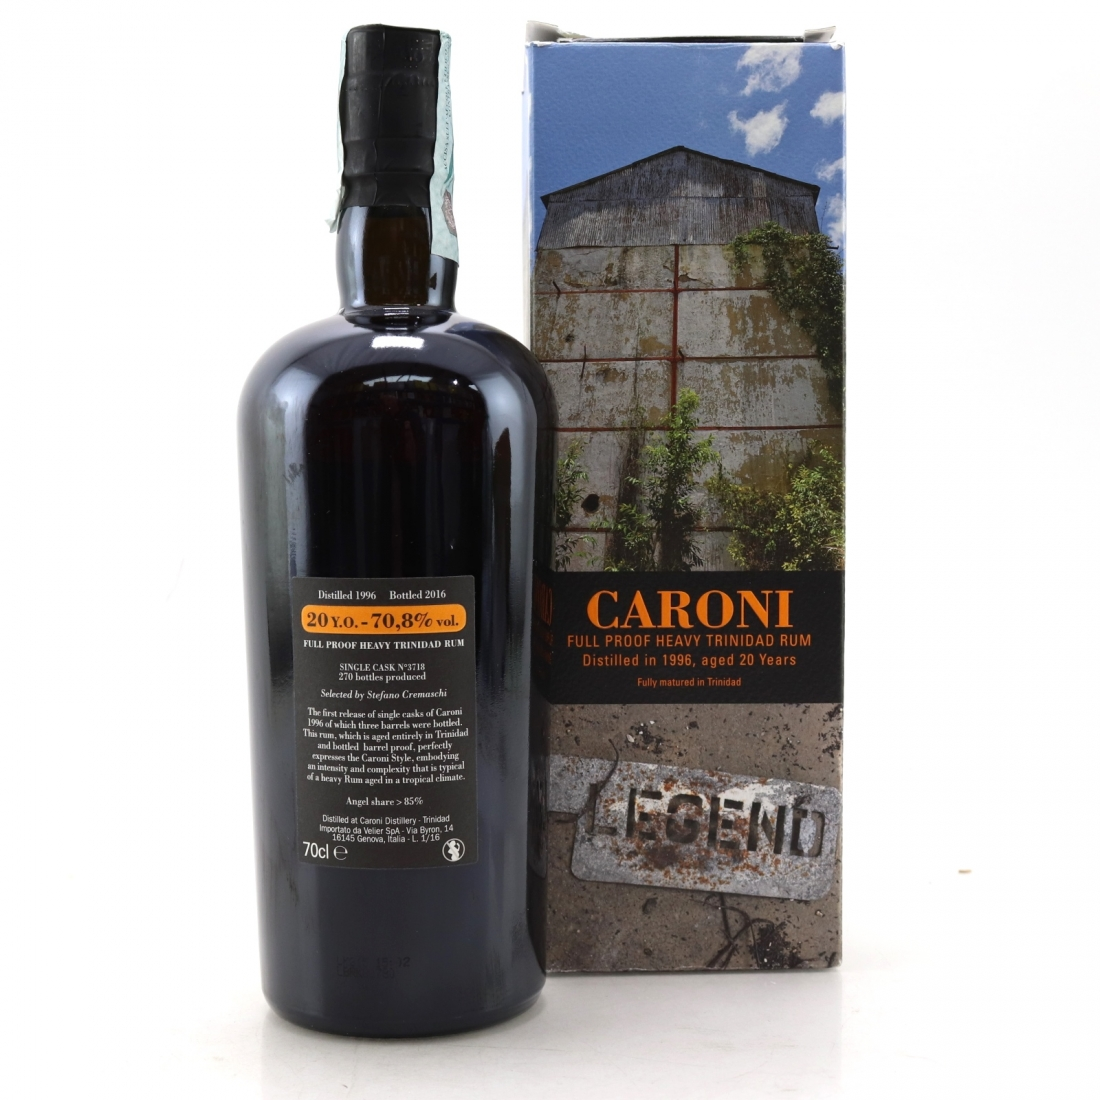 Caroni 1996 Single Cask 20 Year Old Rum / Stefano Cremaschi